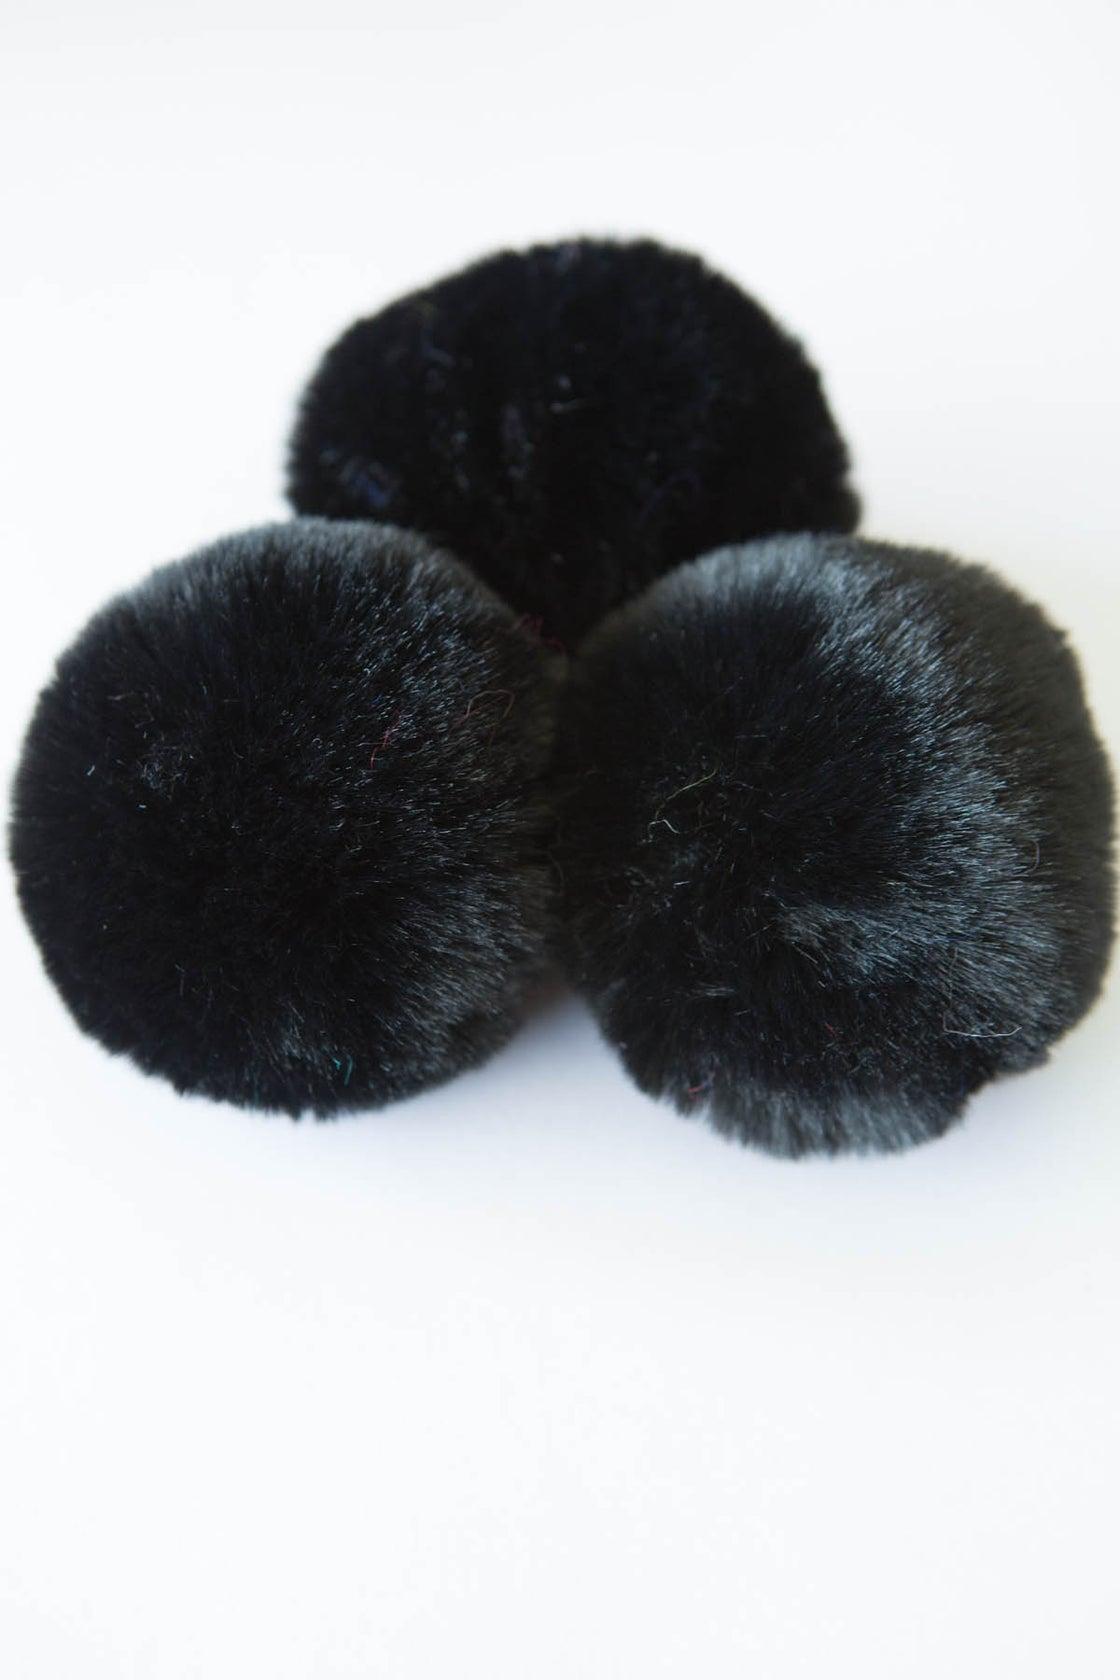 Image of Faux Fur Pompom - Black